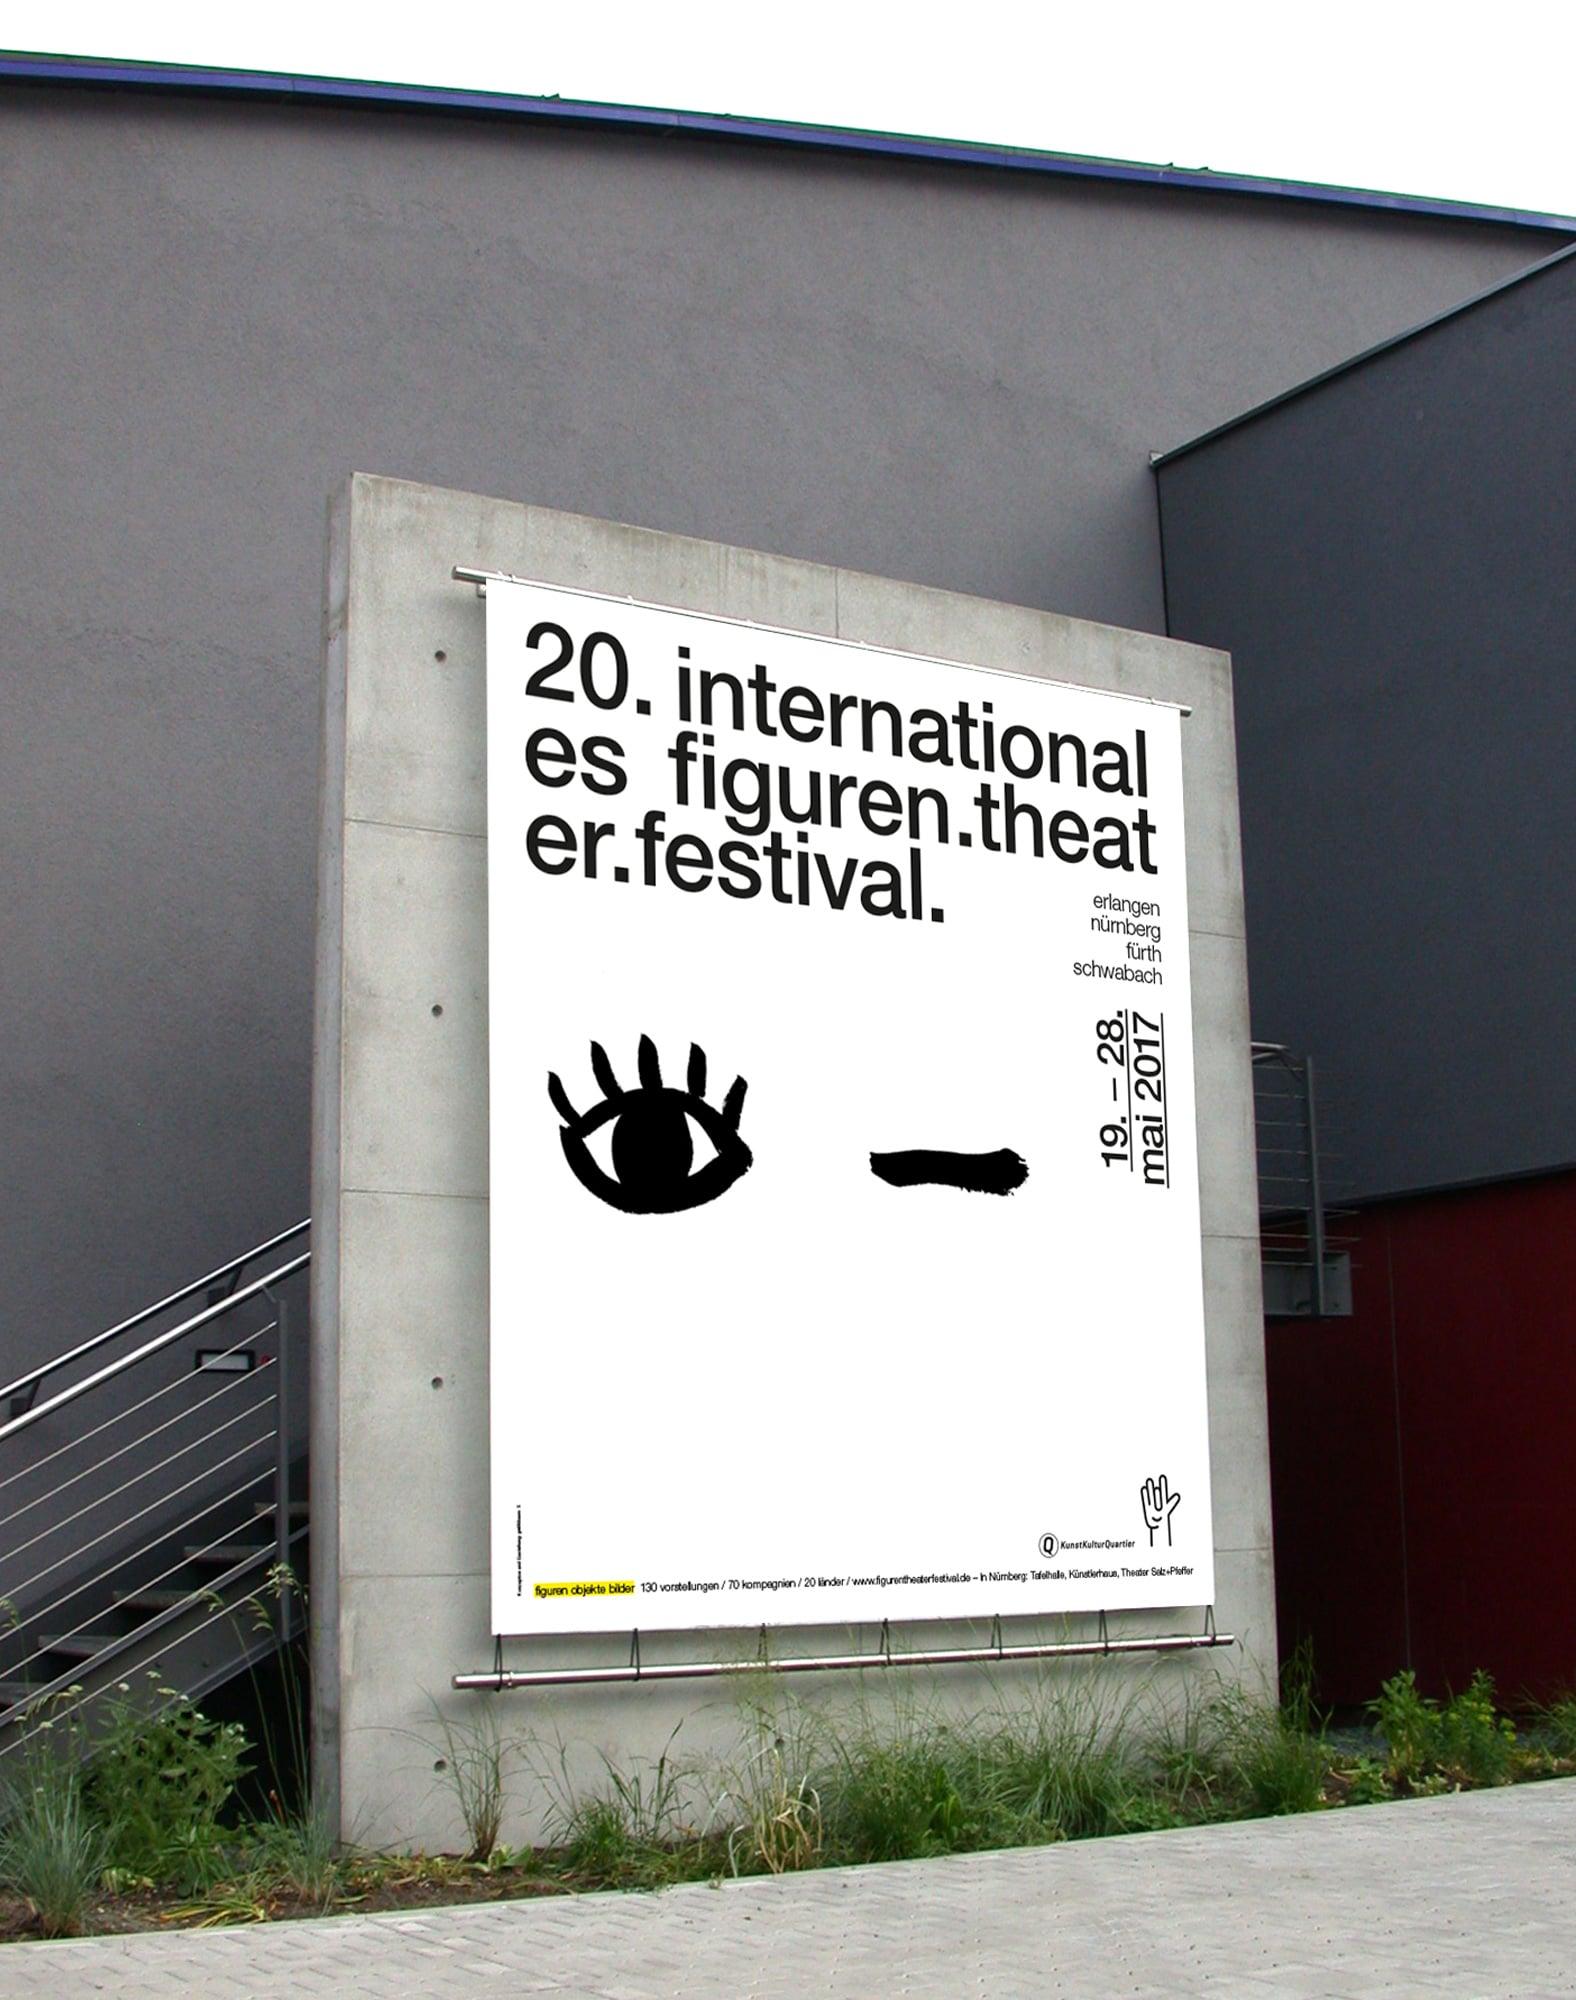 planx-internationales.figuren.theater.festival-2017-Tafelhalle01